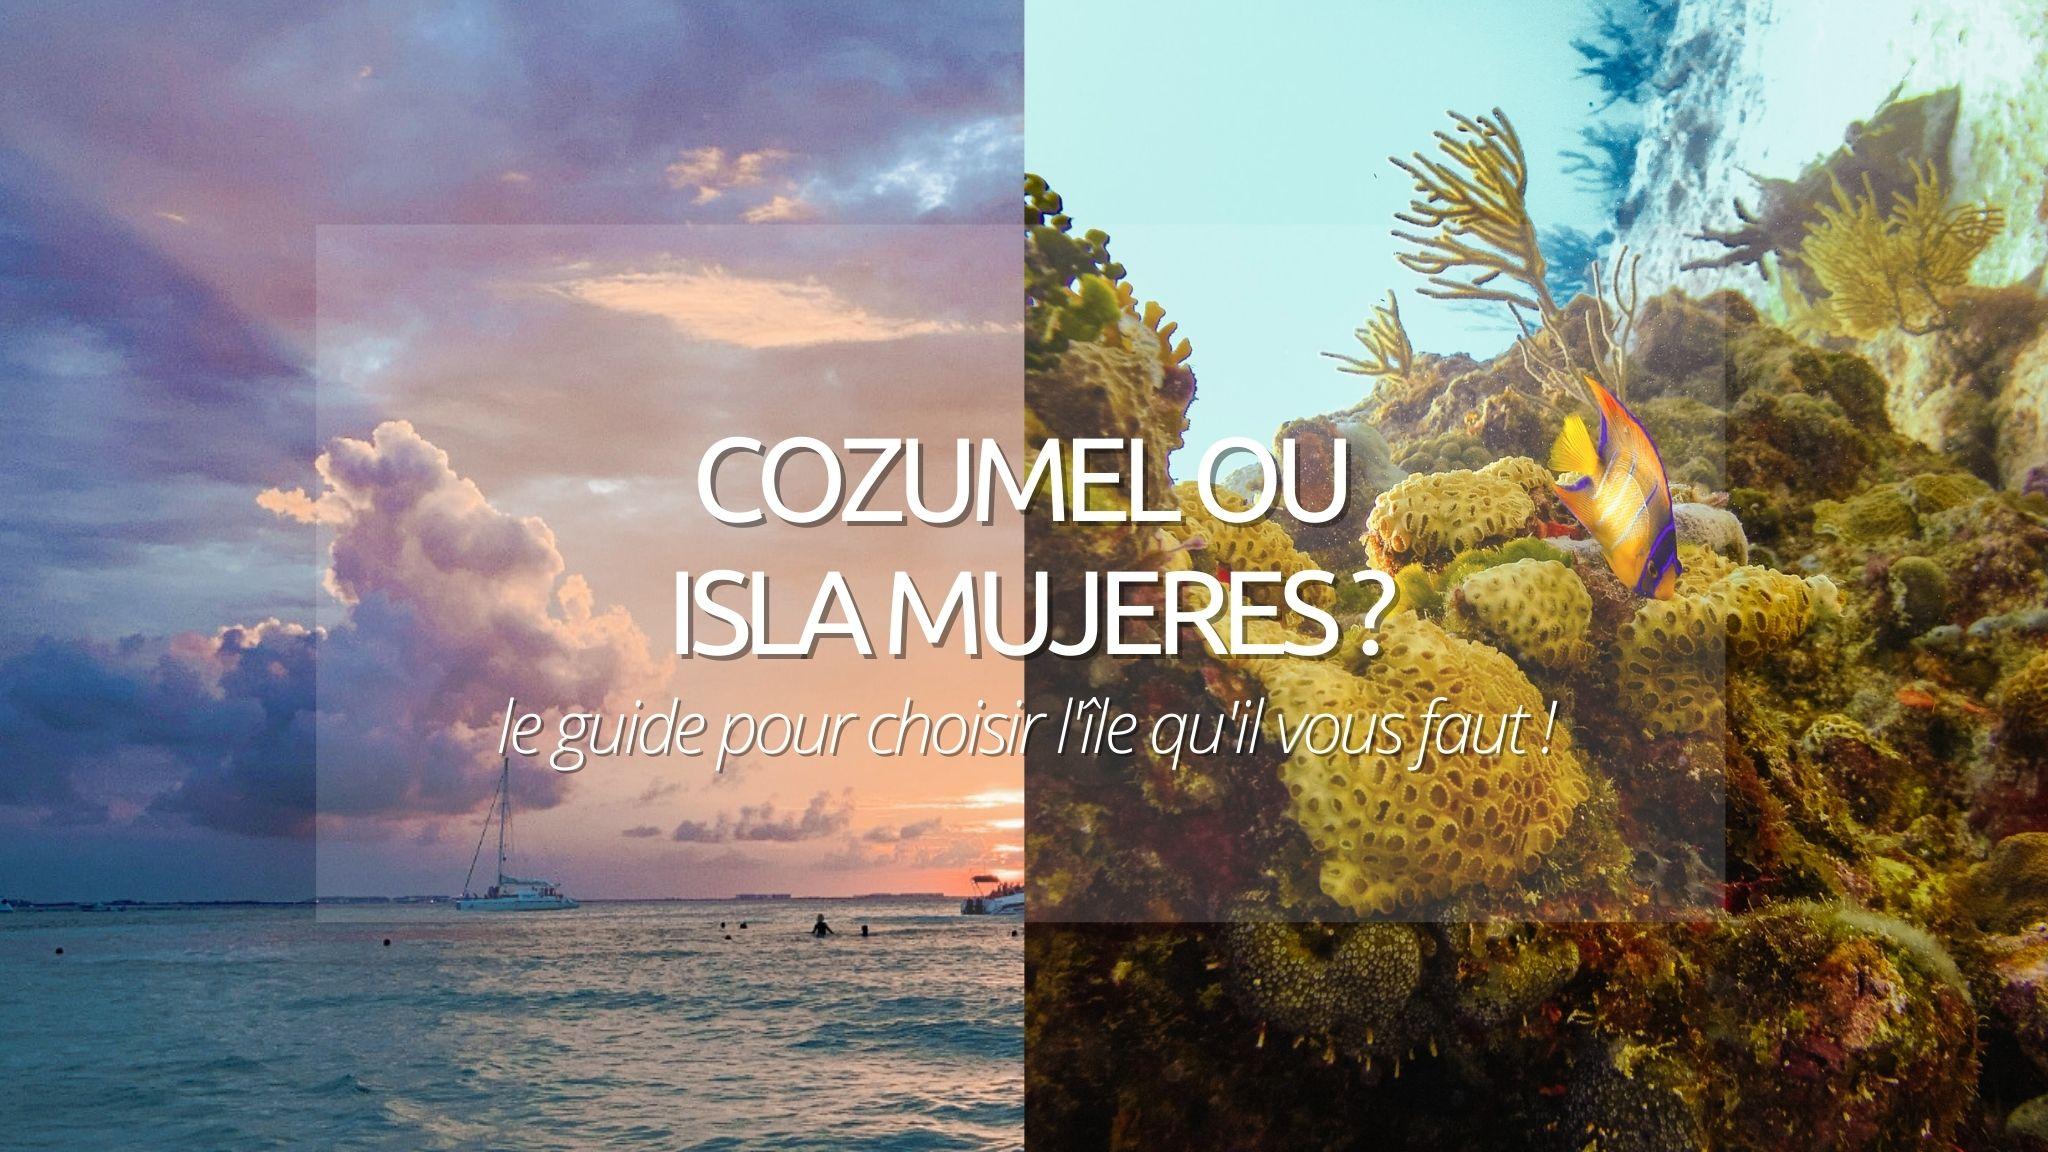 Cozumel ou Isla Mujeres : quelle île choisir sur la Riviera Maya ?